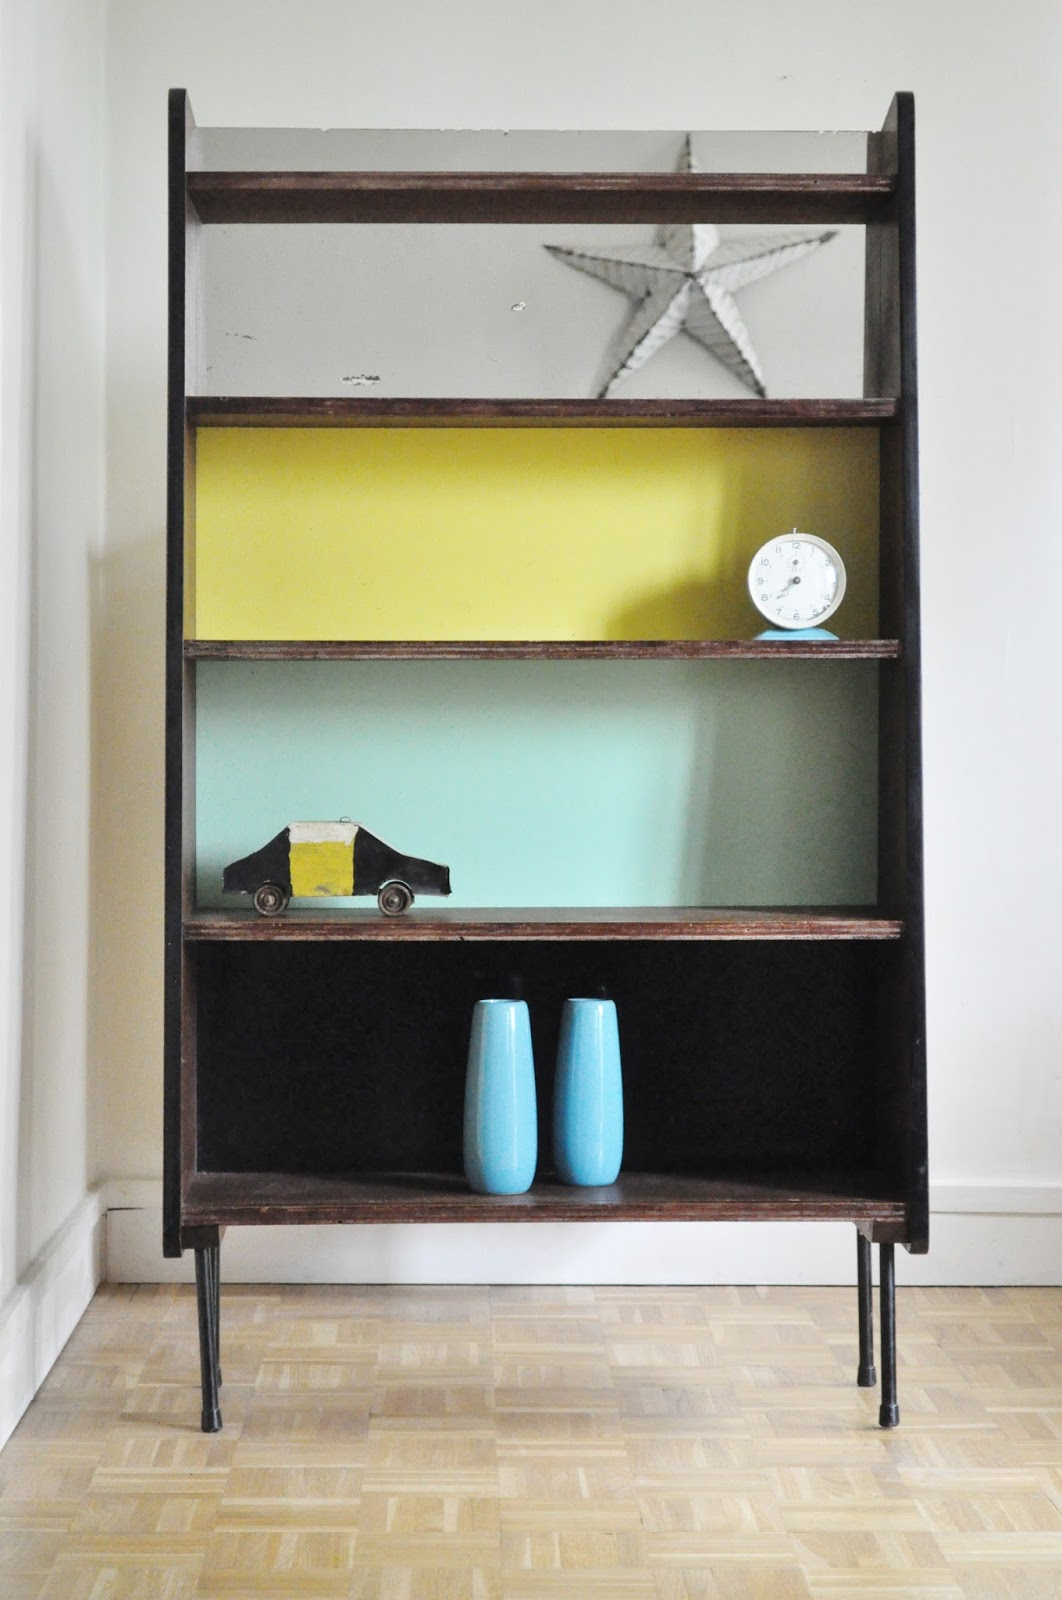 le vide grenier d 39 une parisienne mariekke. Black Bedroom Furniture Sets. Home Design Ideas